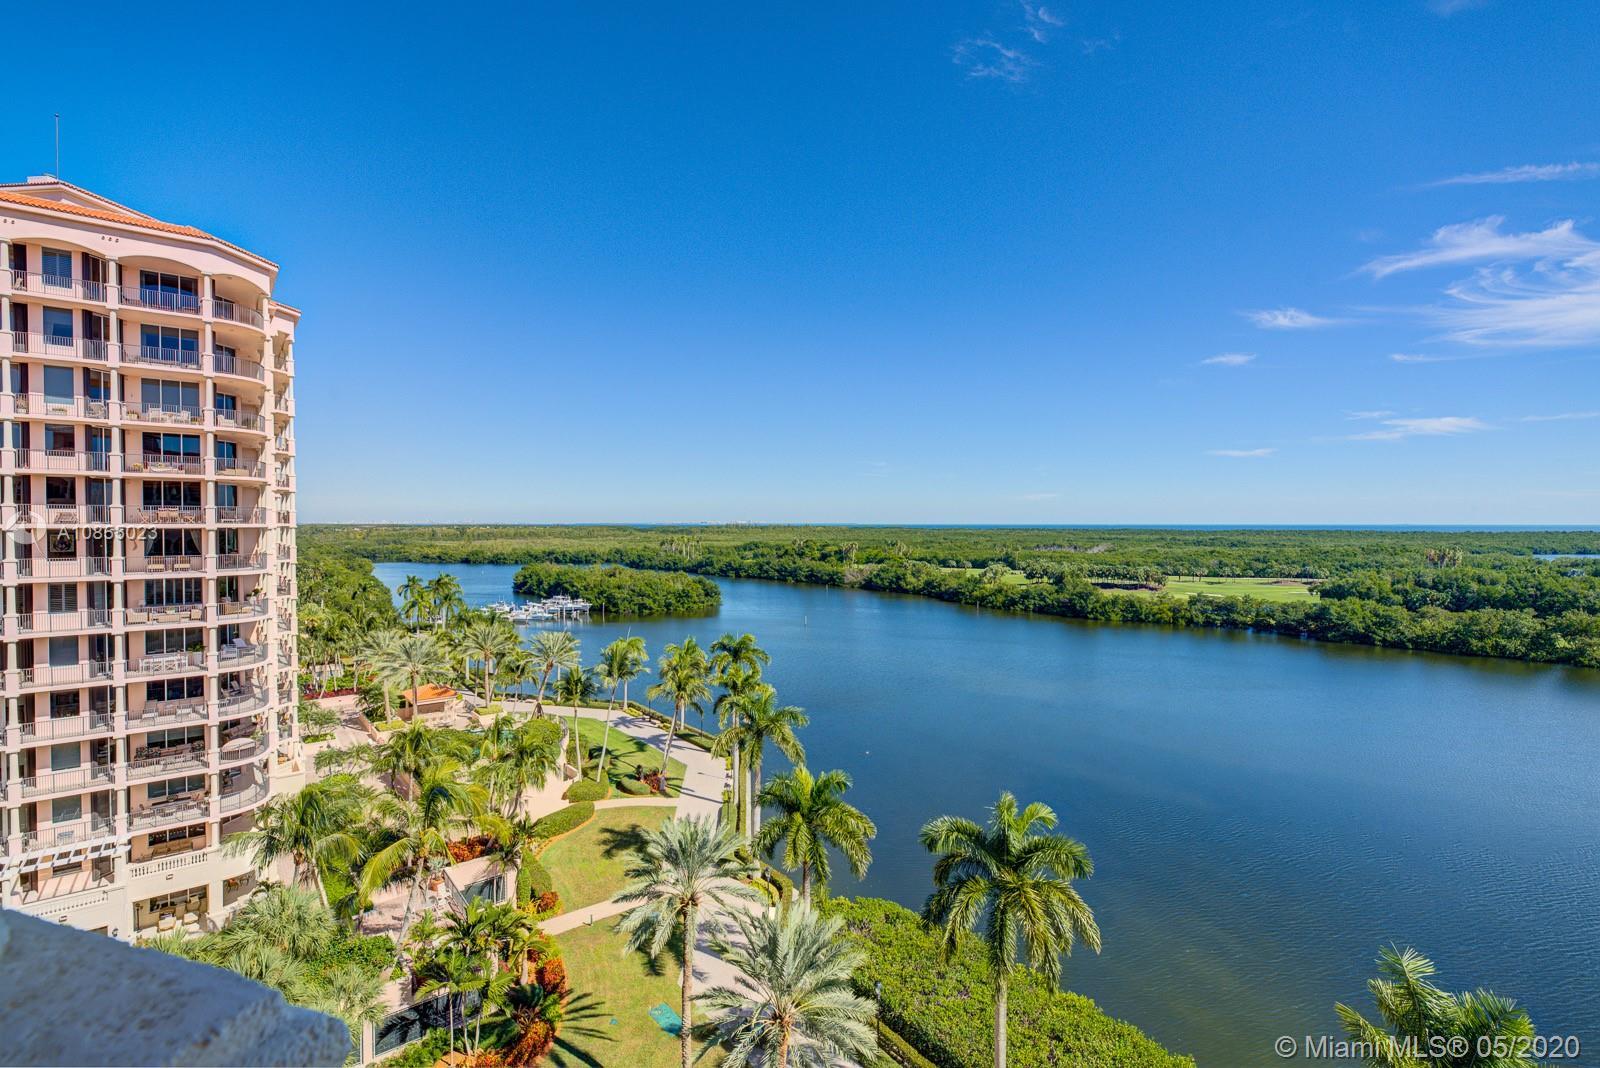 Property for sale at 13635 Deering Bay Dr, Coral Gables,  Florida 33158